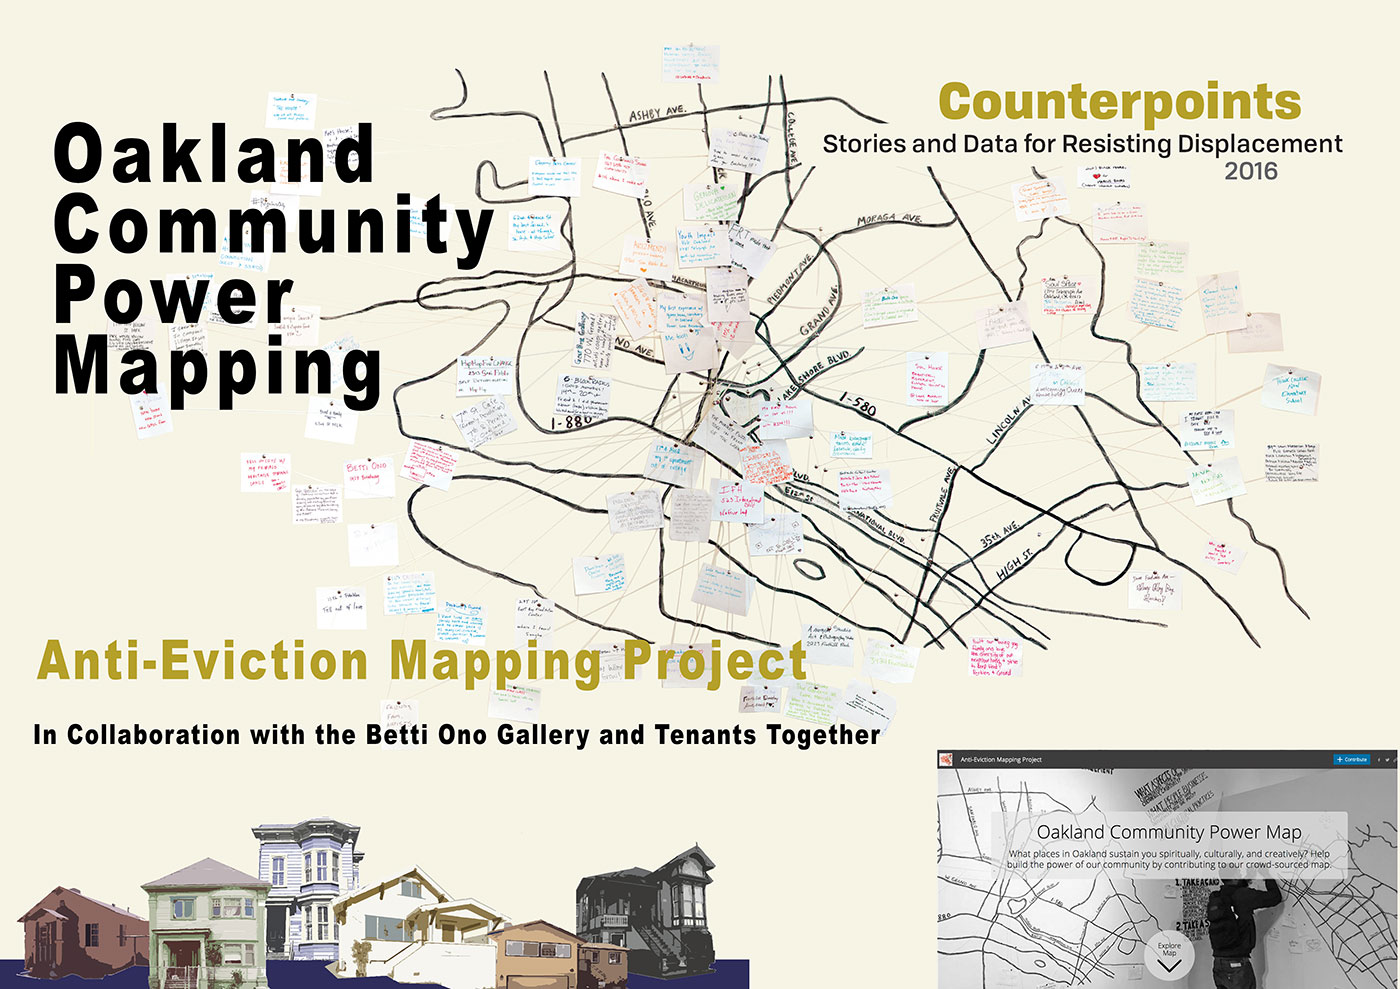 Eviction Prevention Representation, 2016, Saito Group and AEMP © AEMP and Saito Group